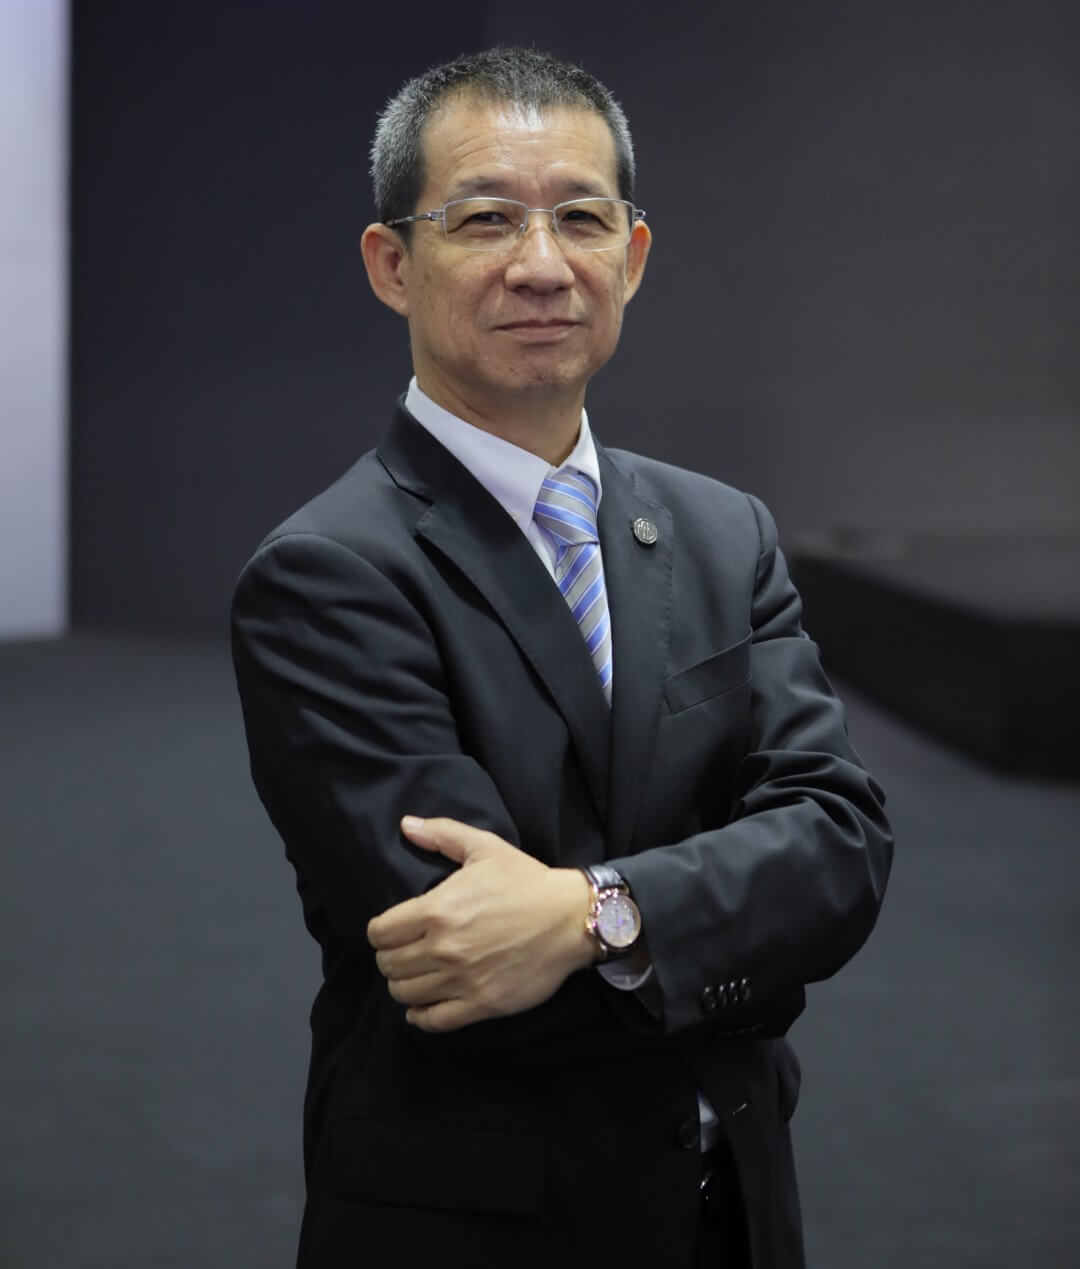 MG – นายพงษ์ศักดิ์ เลิศฤดีวัฒนวงศ์ รองกรรมการผู้จัดการ บริษัท เอ็มจี เซลส์ (ประเทศไทย) จำกัด (Large)